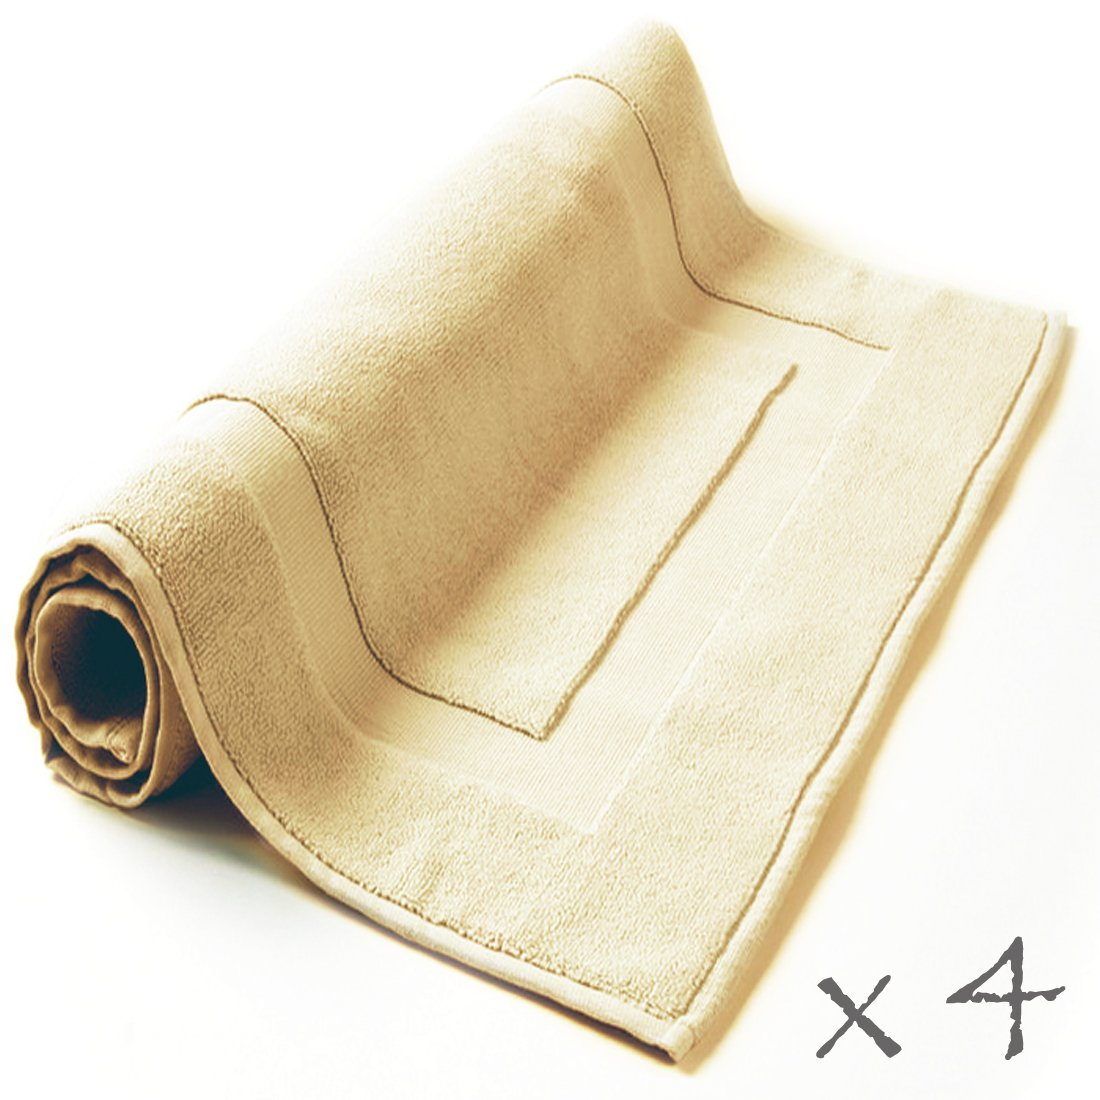 Hotel Collection - 4 piece Bath Rug Set, Sumptuous Terry, Color: Natural Beige, 100% Eco-Friendly Turkish Cotton